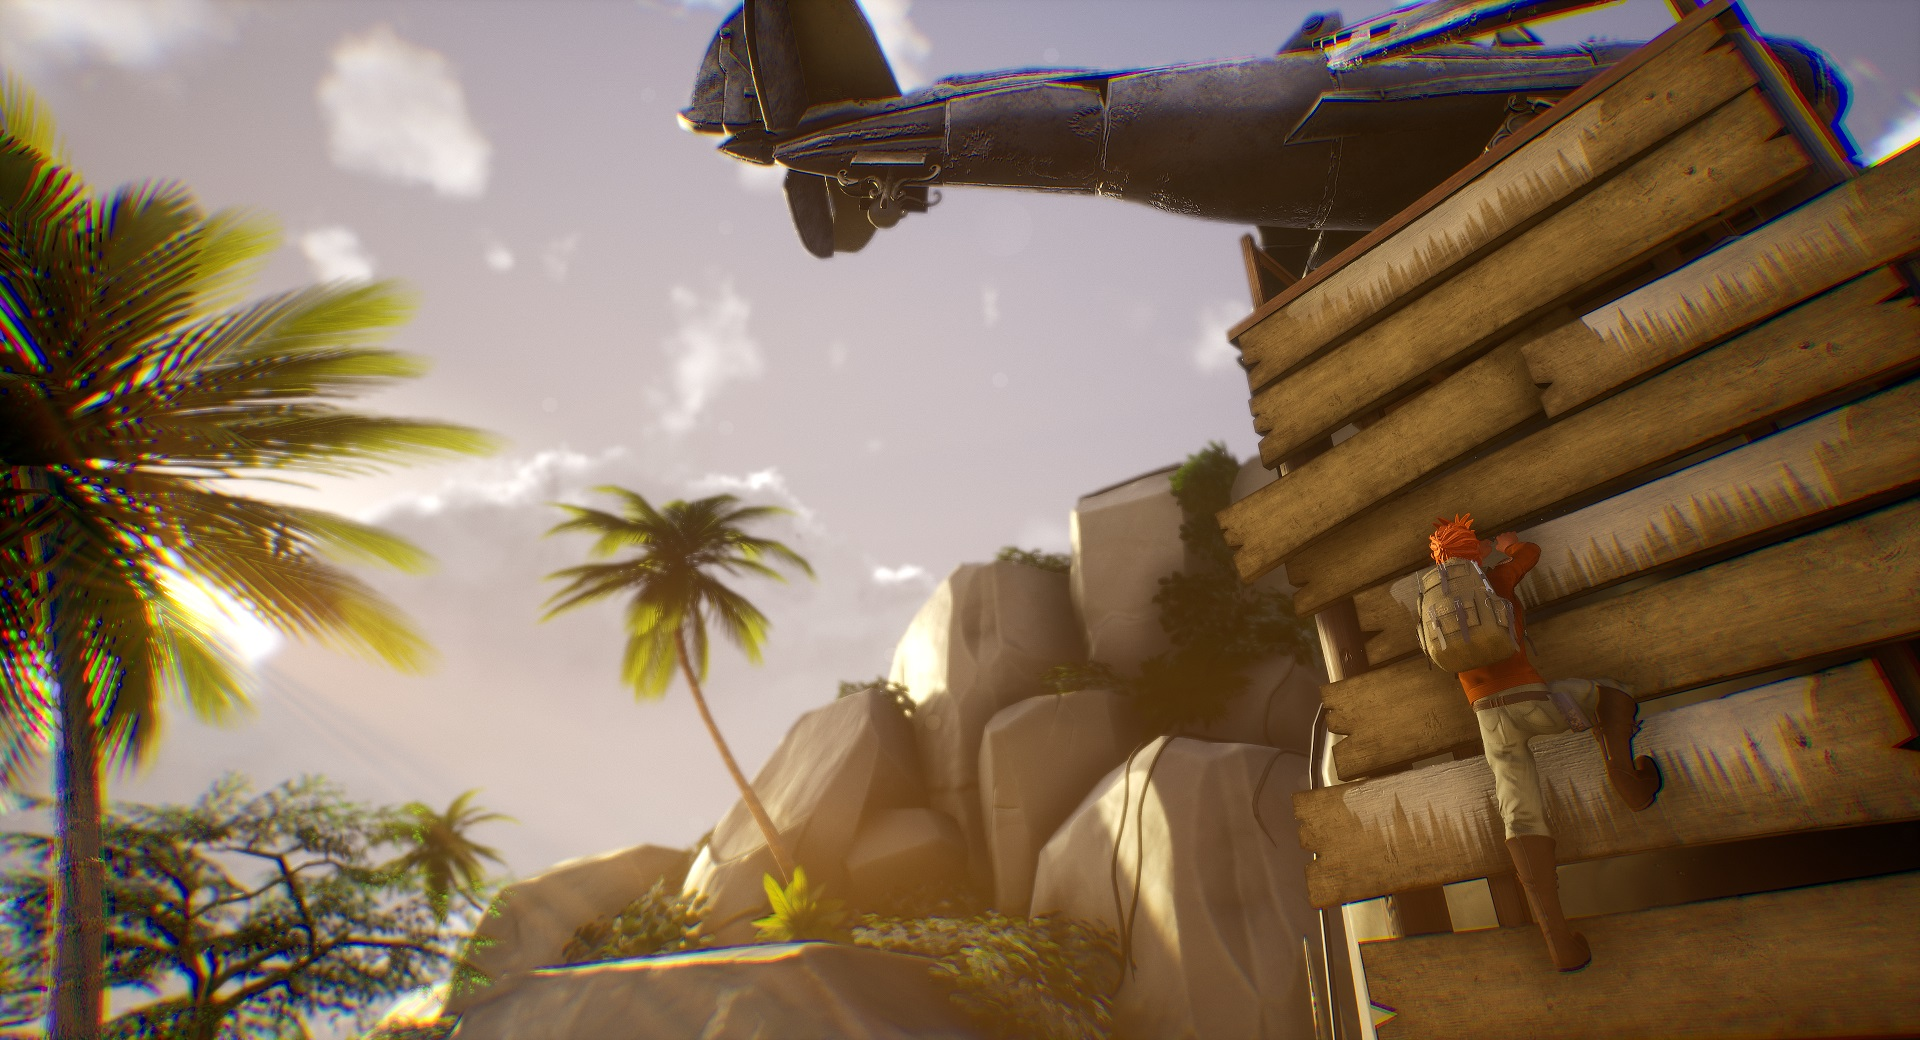 Hazel Sky looks like an indie cross between Uncharted and Firewatch screenshot